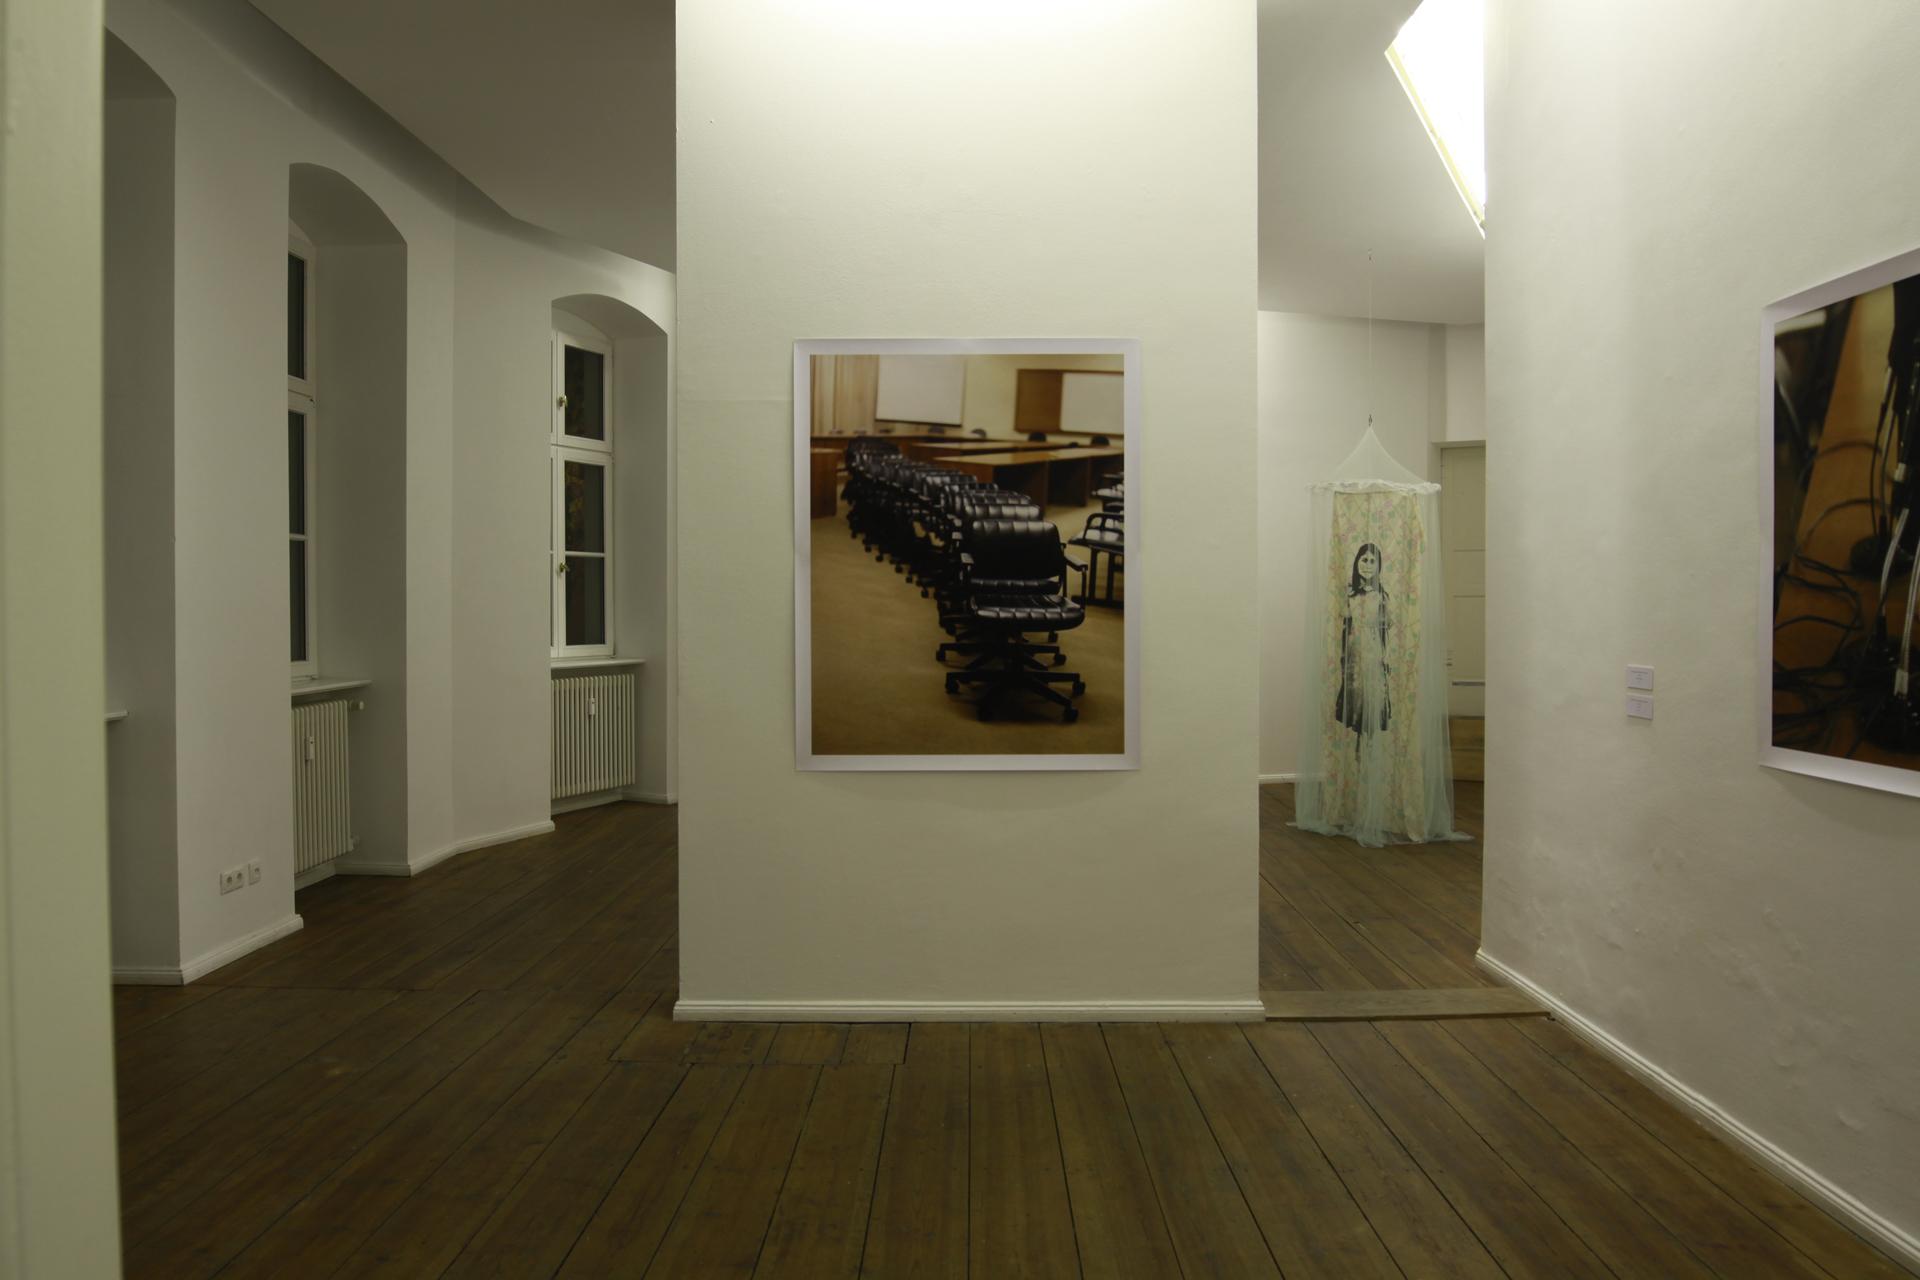 2016_juef_kurator_grimmuseum_22-carlos-melo-alexandre-sequeira